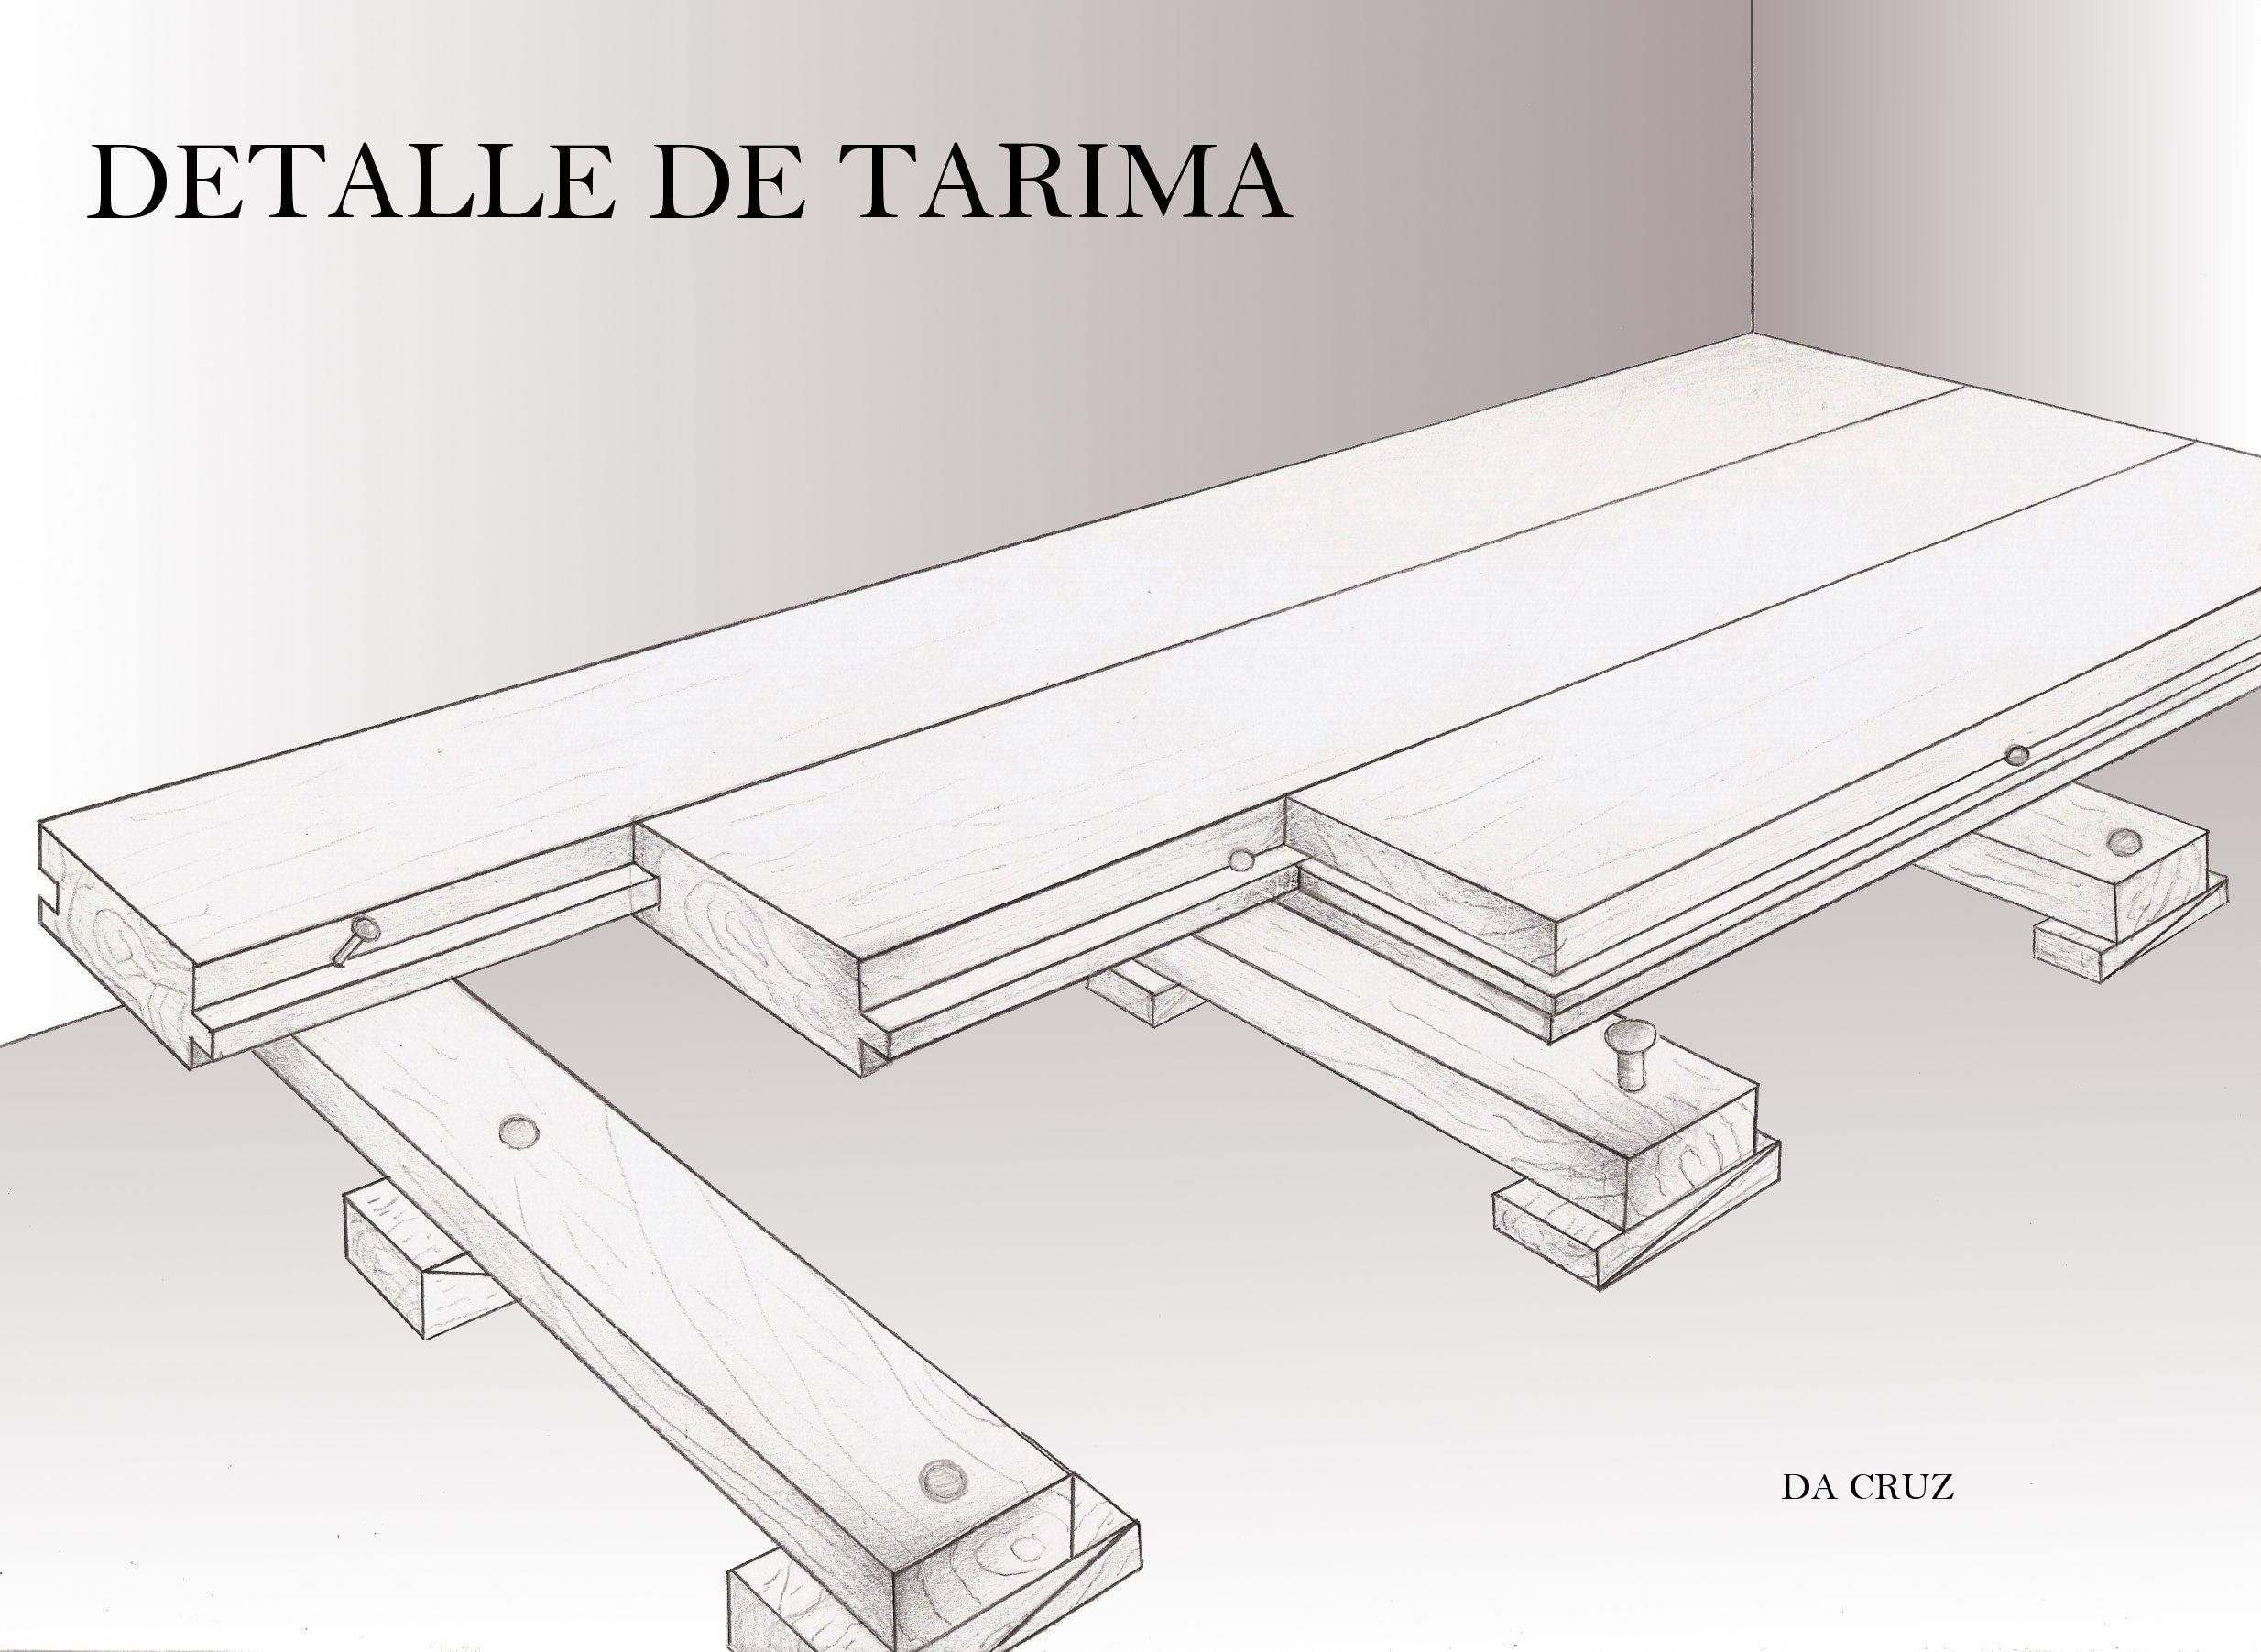 Tipos de pavimentos arq secci n ct pinterest - Clases de pavimentos ...